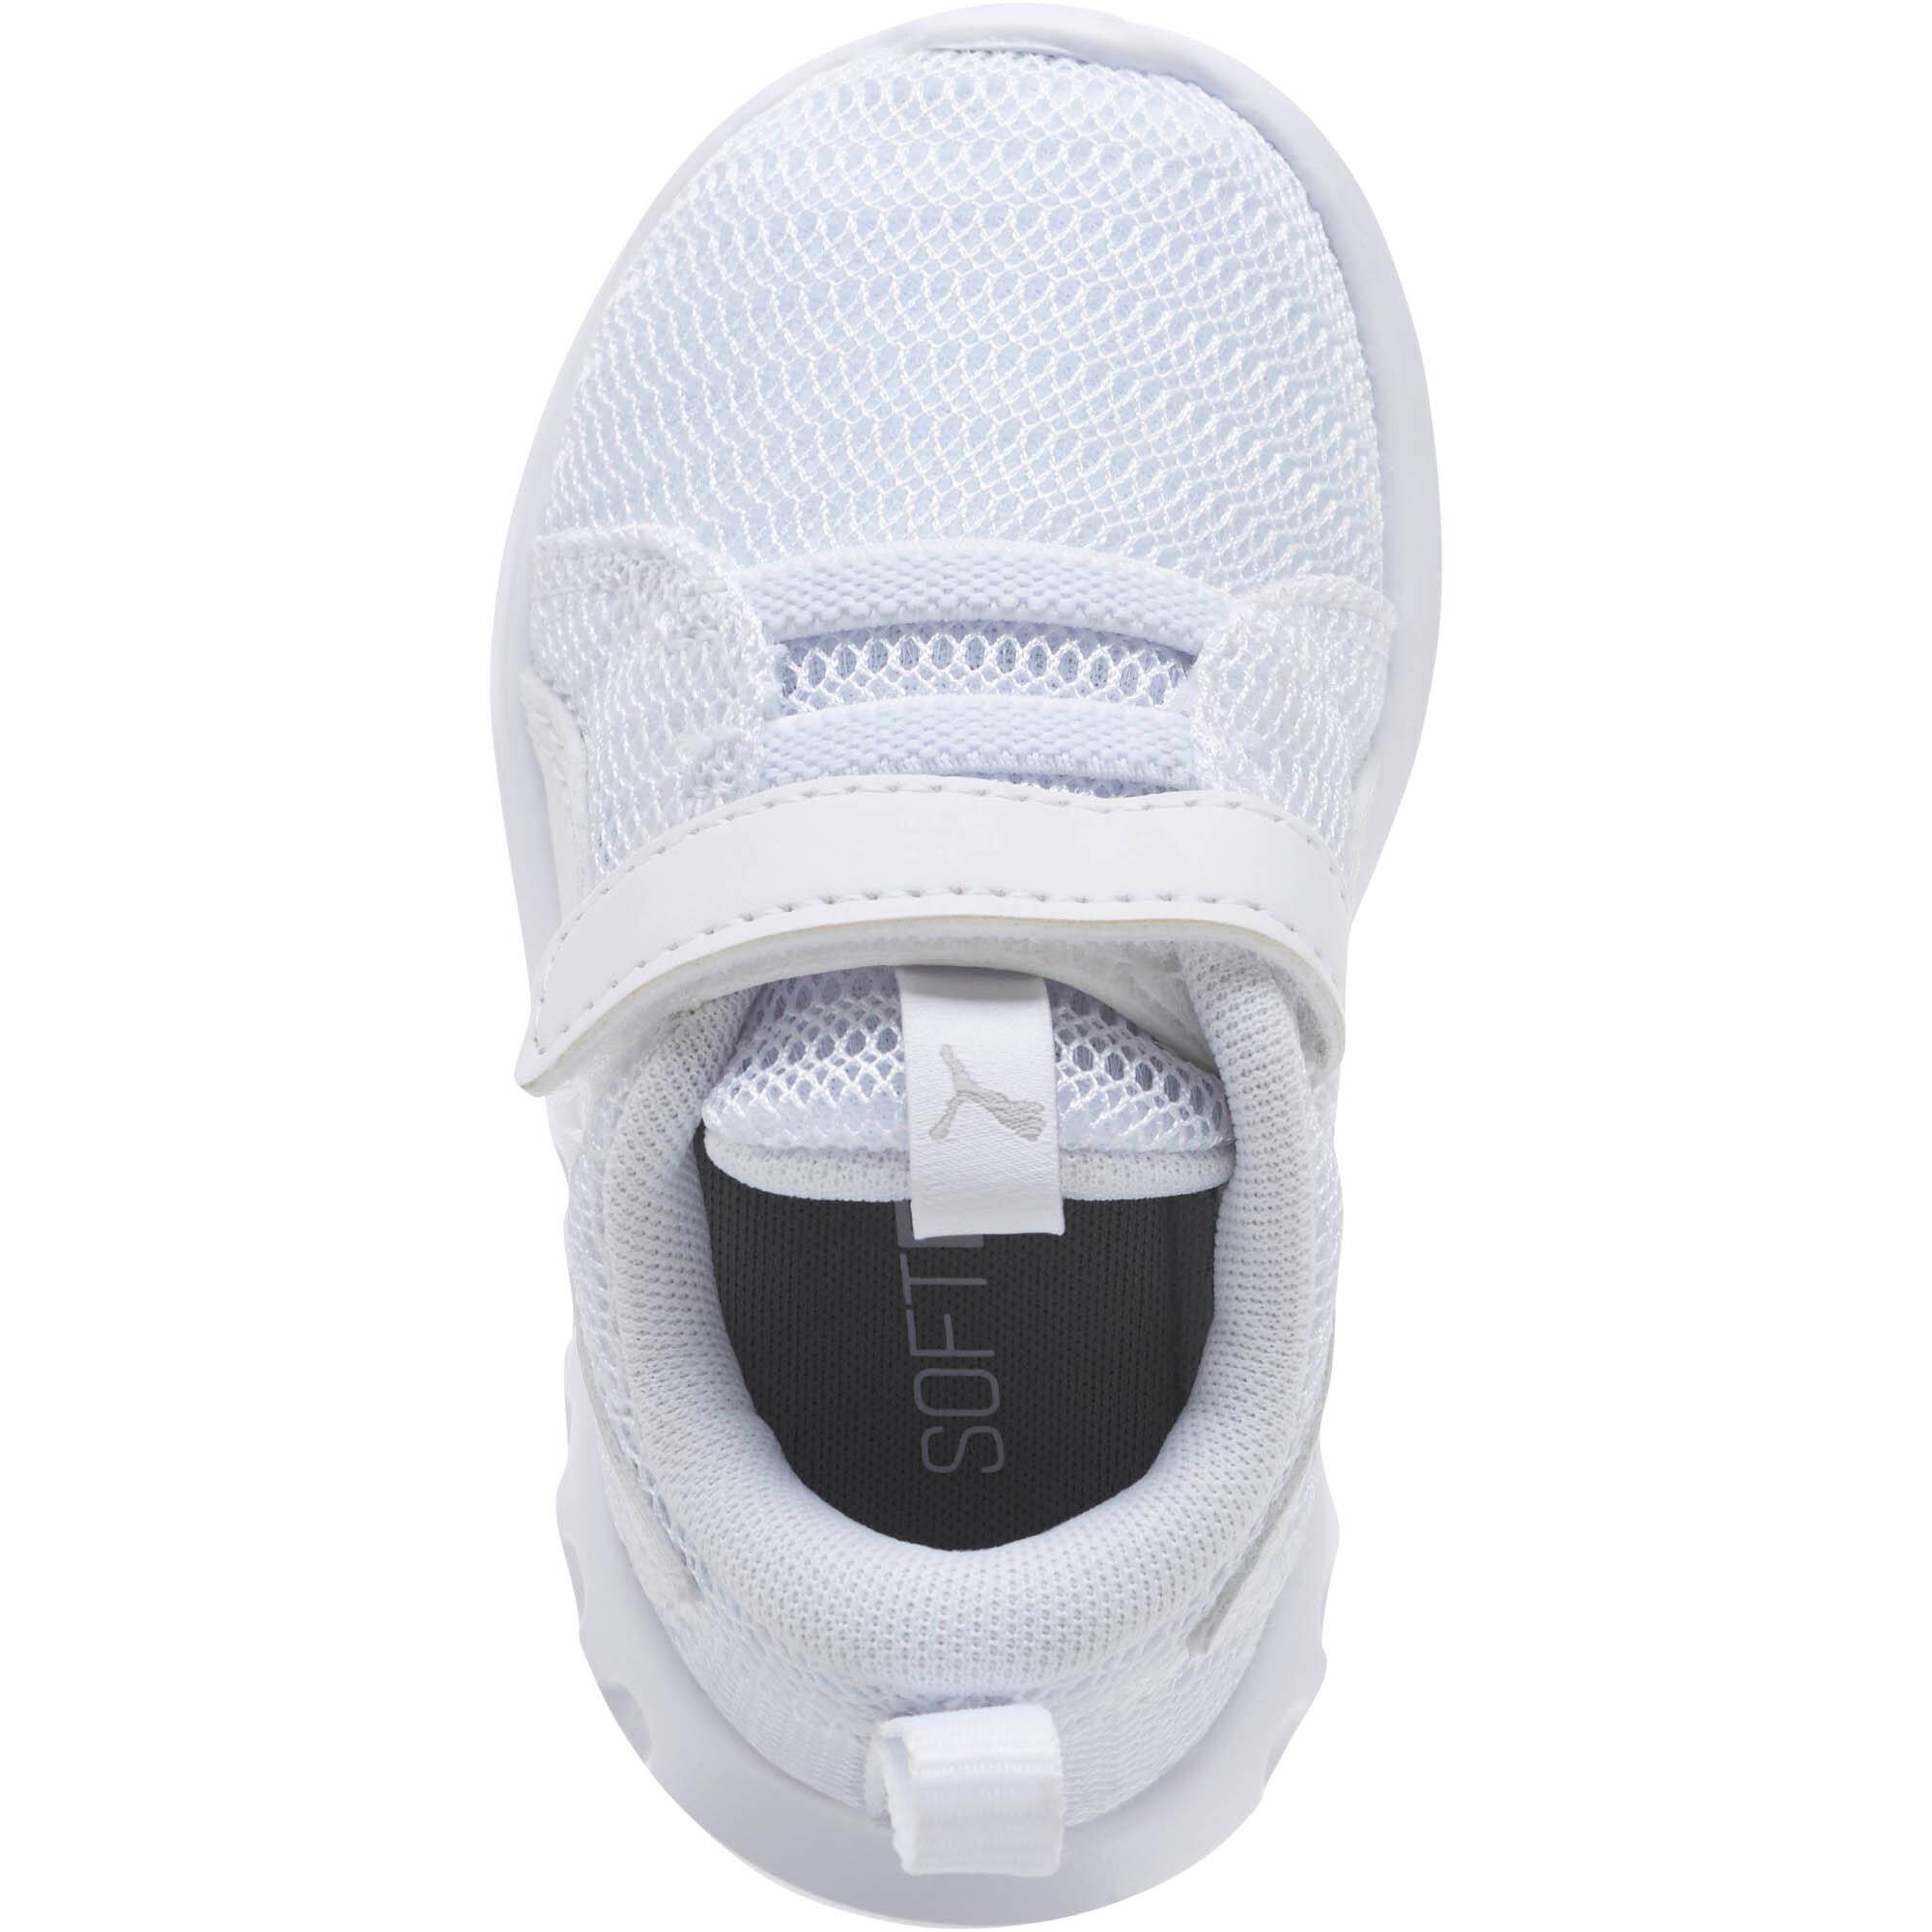 PUMA-Carson-2-Toddler-Shoes-Unisex-Shoe-Kids thumbnail 10